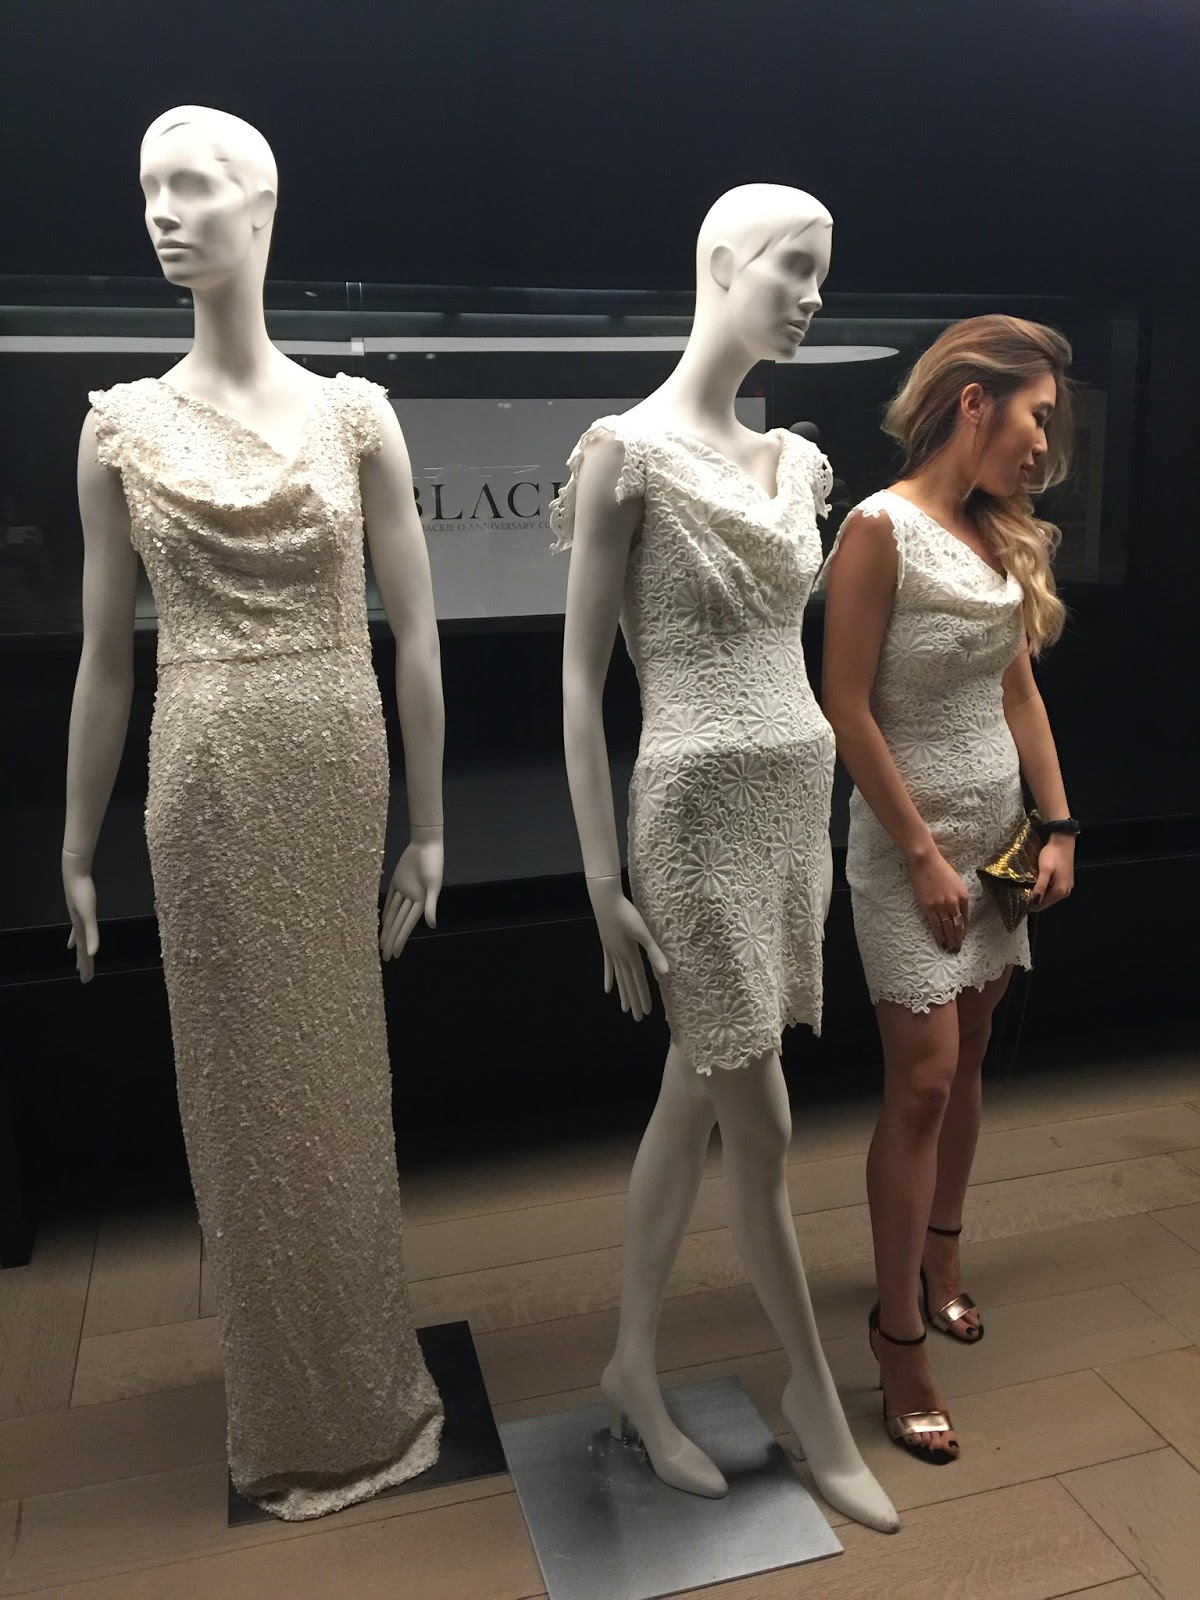 Mossy Oak Wedding Dresses 44 Luxury Creamy ivory tones as